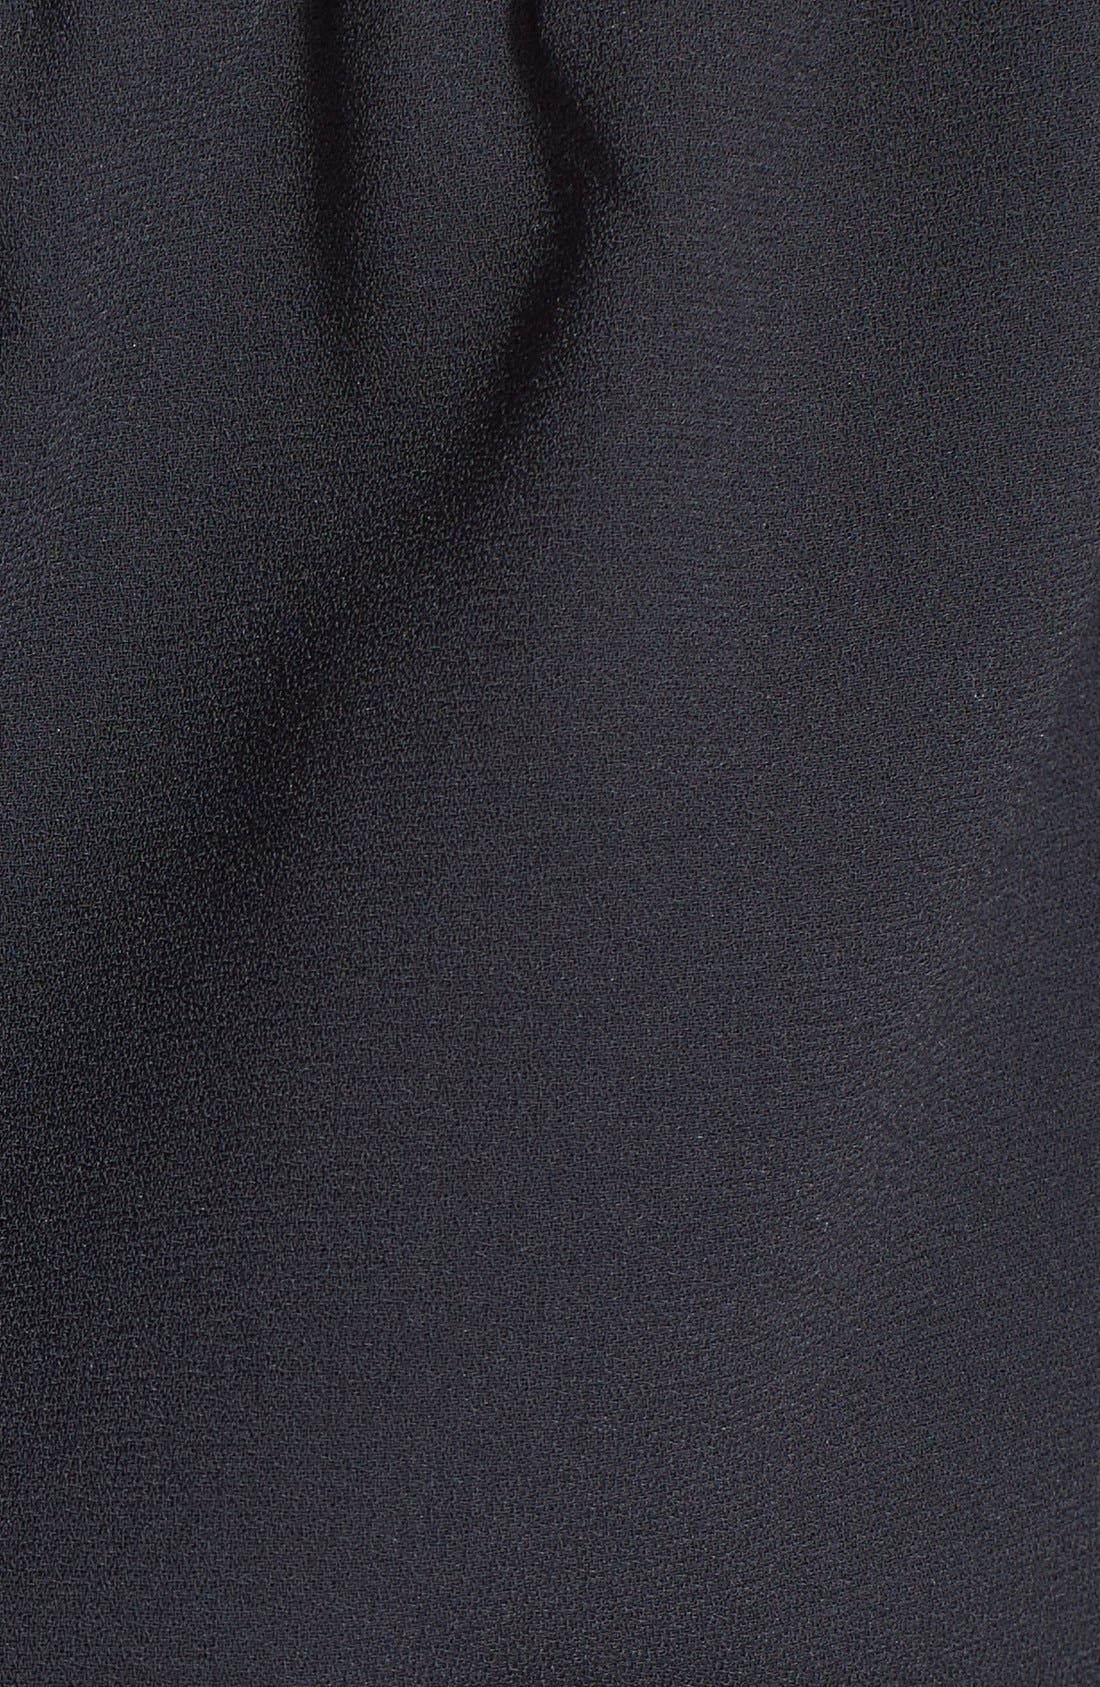 Alternate Image 3  - Joie 'Fairley' Drawstring Waist Strapless Jumpsuit